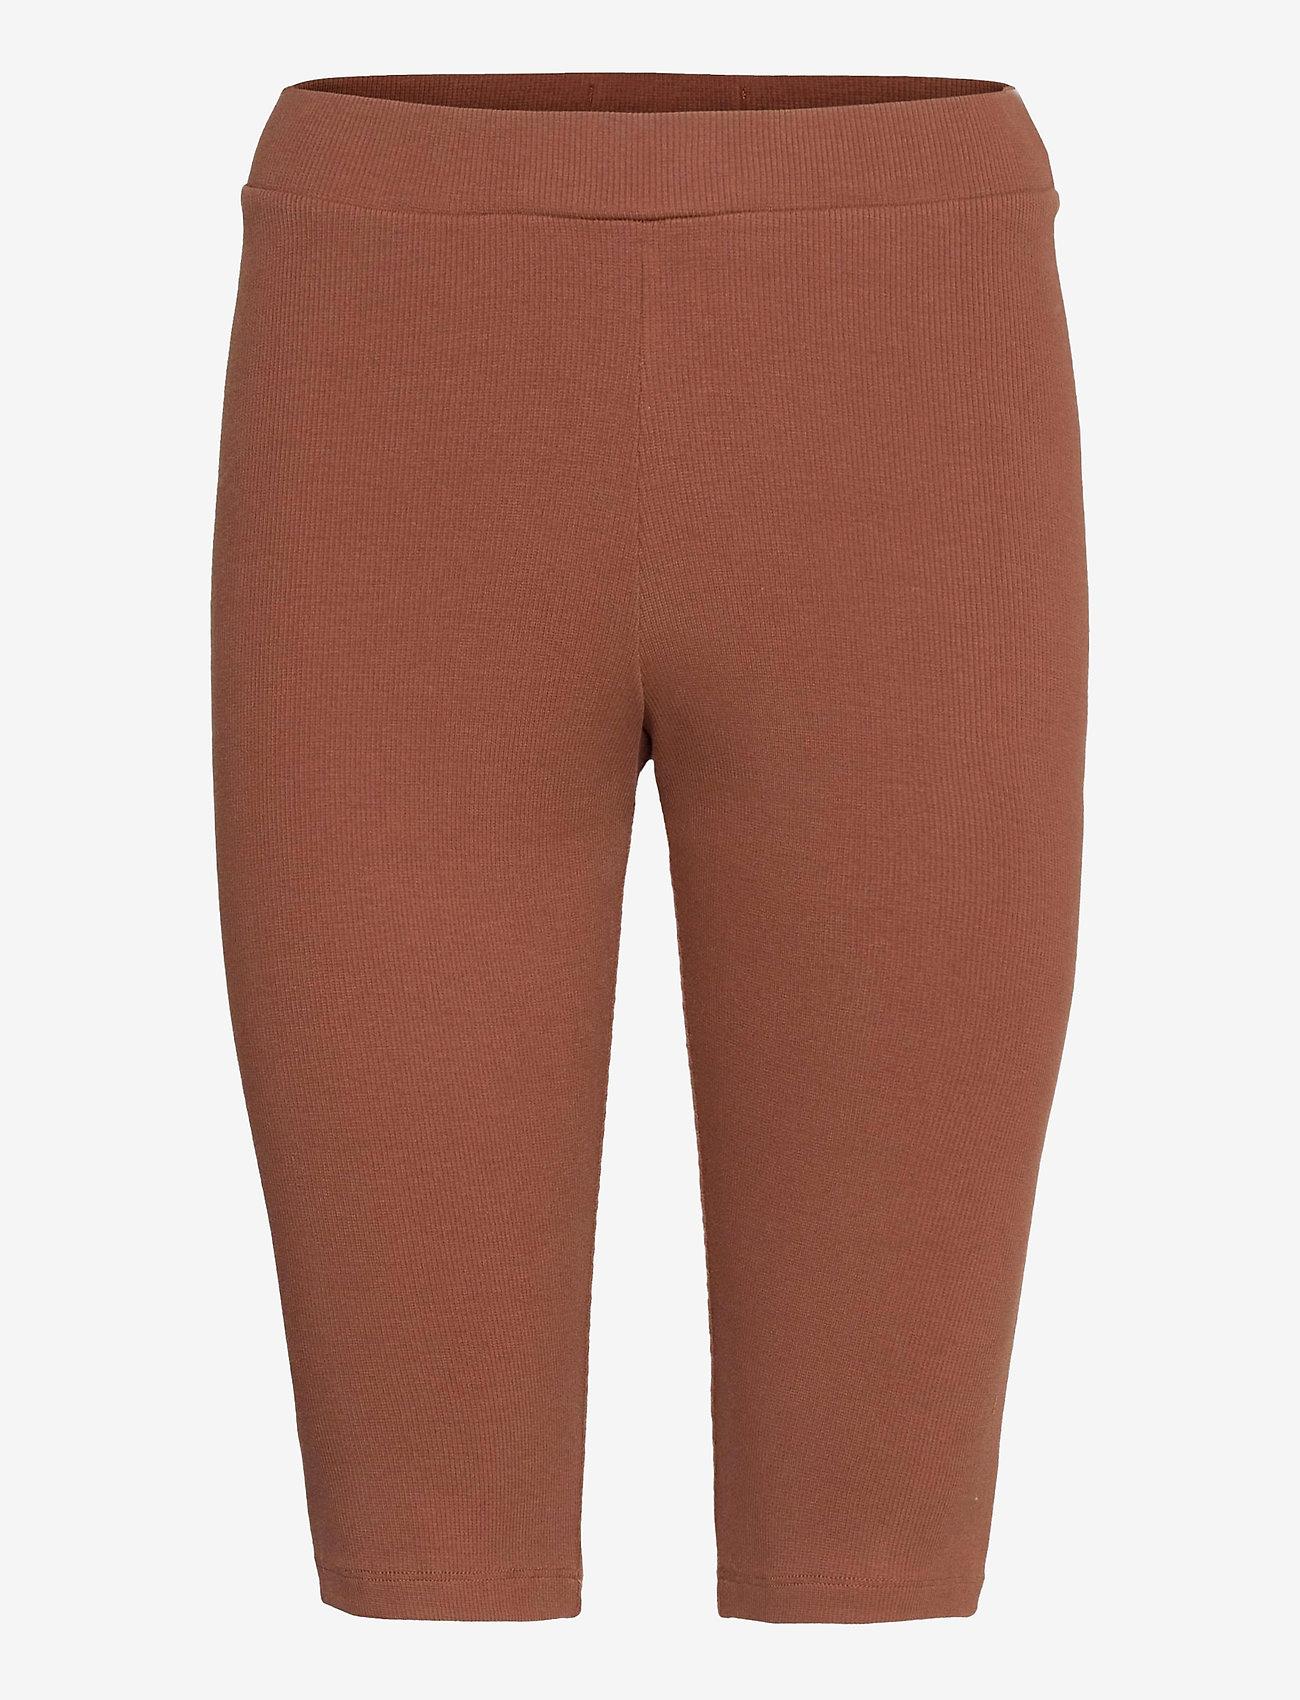 Blanche - Rosa Rib Shorts - cykelshorts - soil - 0